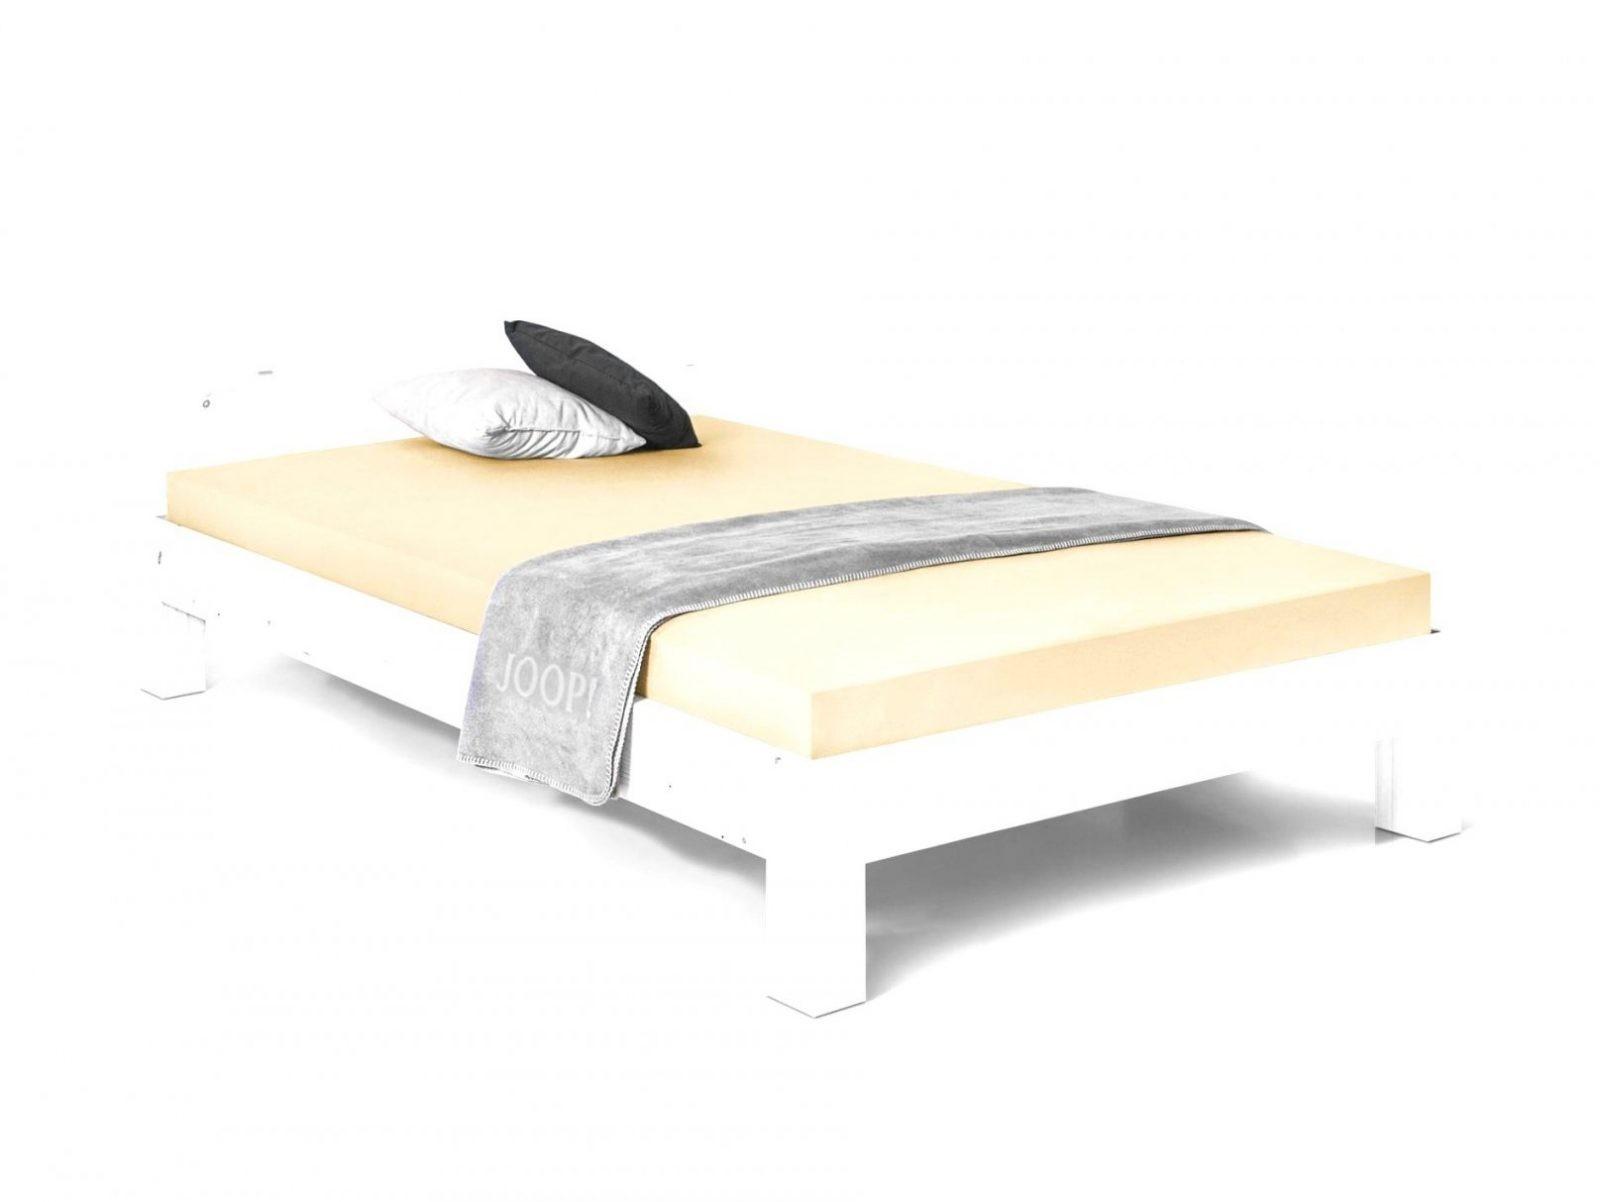 Bett 140×200 Mit Lattenrost Und Matratze Elegant Bett Mit Matratze von Bett 120X200 Mit Matratze Und Lattenrost Photo